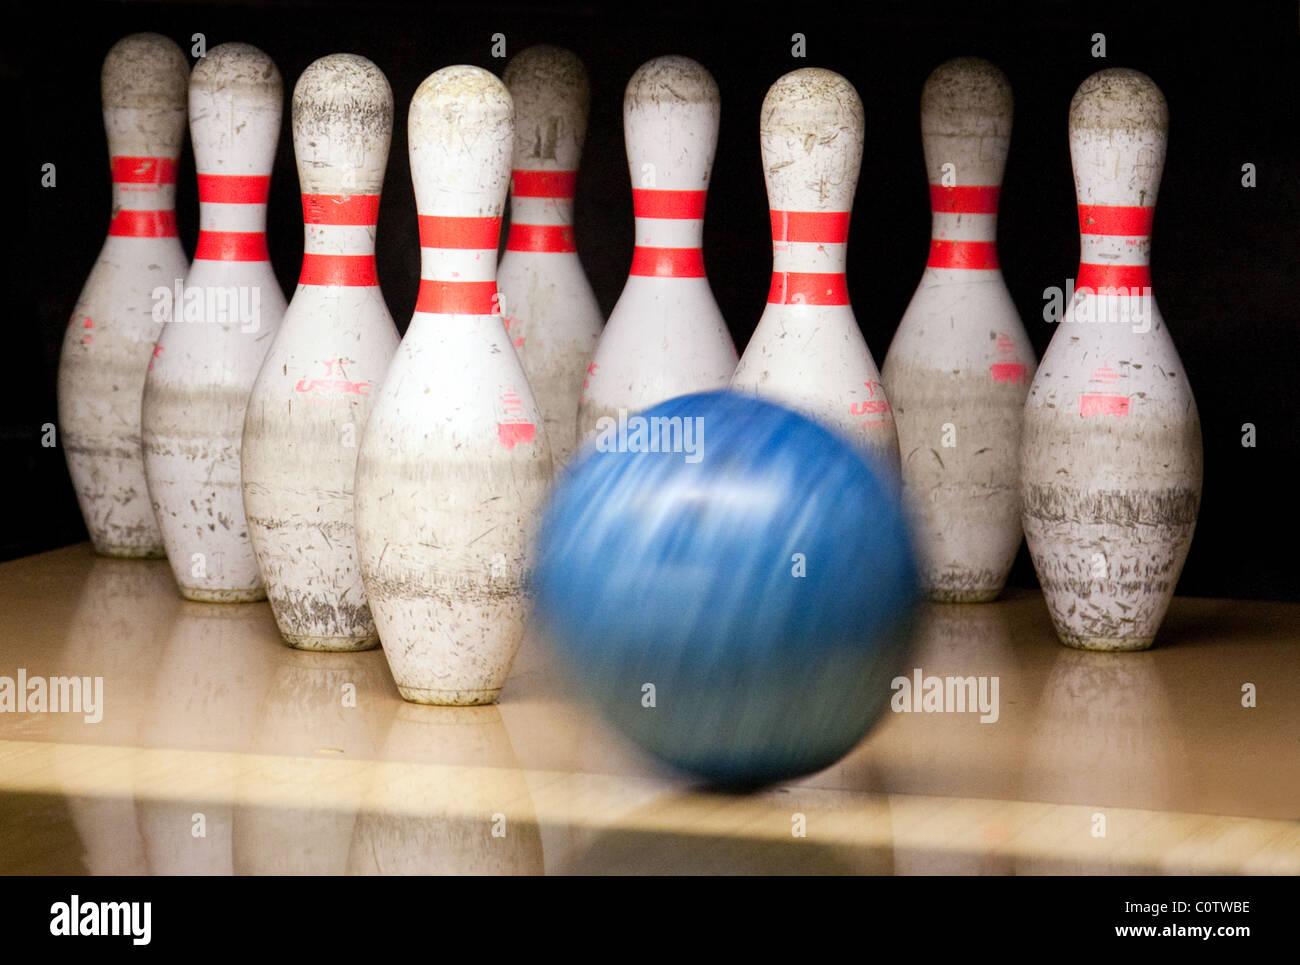 Eine Bowling Kugel Kegeln in eine Ten Pin Bowling Bahn,